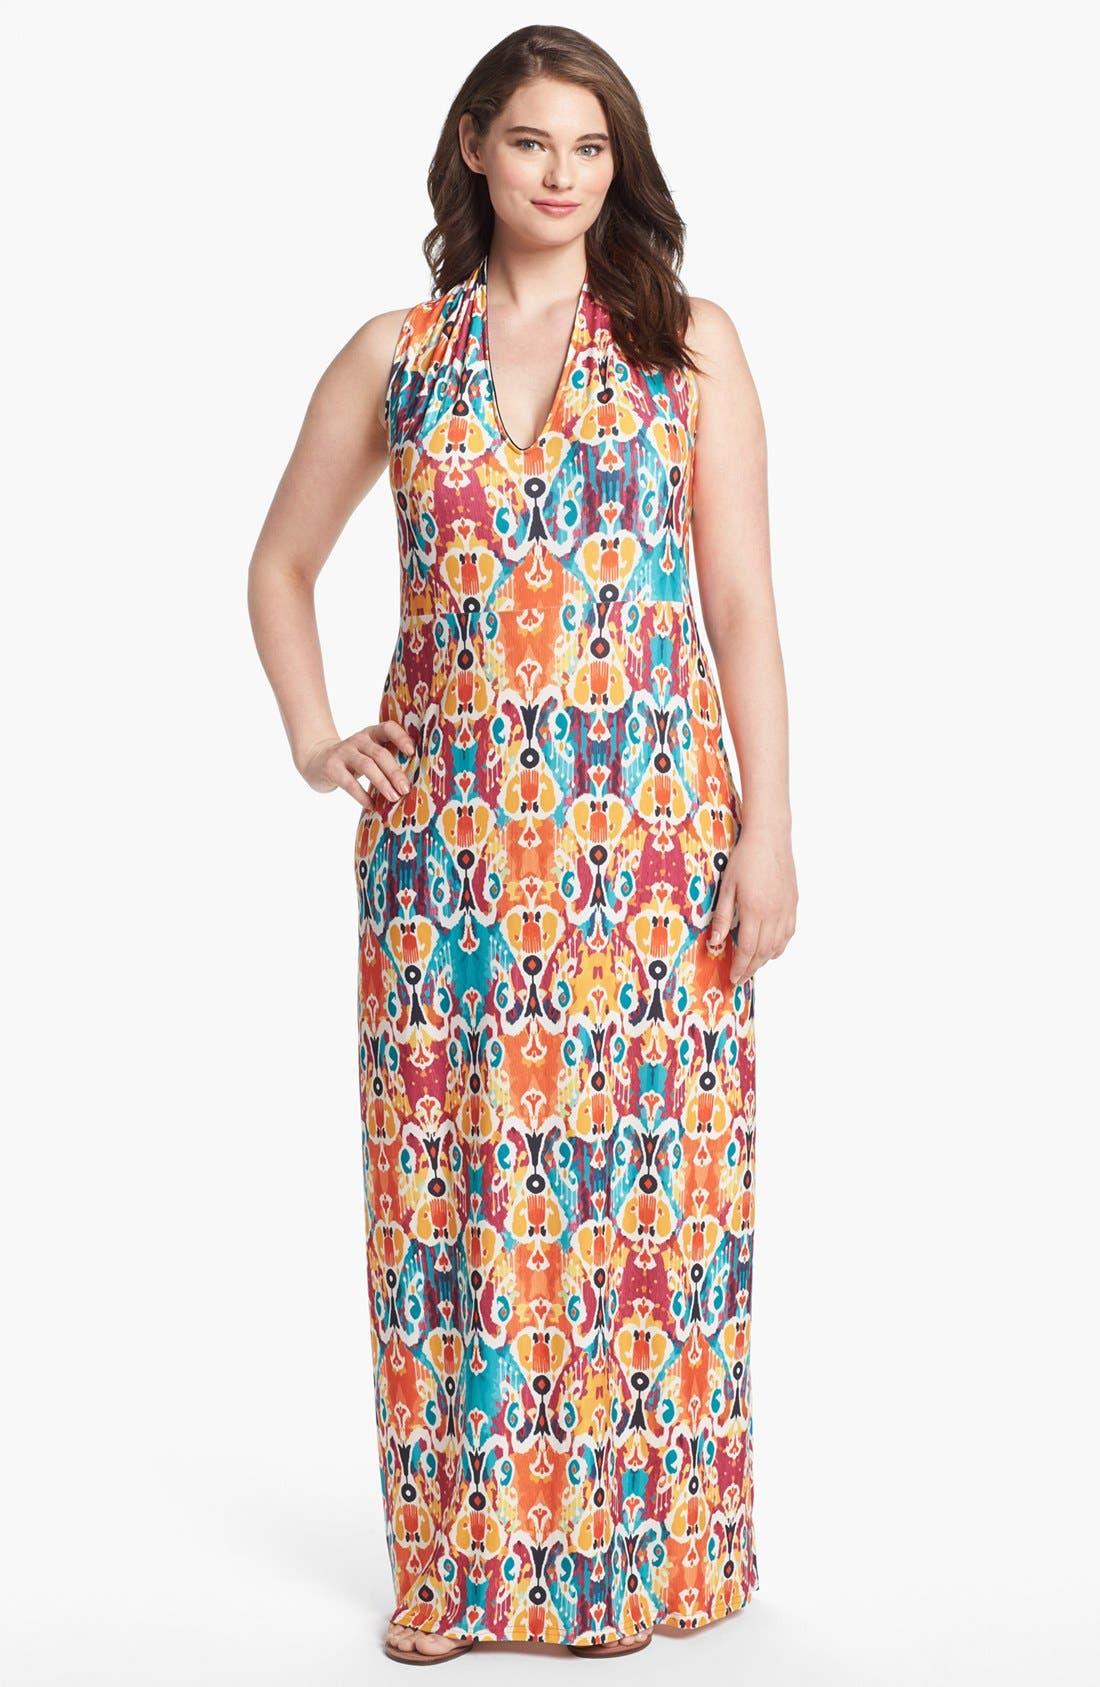 Main Image - Viereck 'Vendome' Print Maxi Dress (Plus Size)